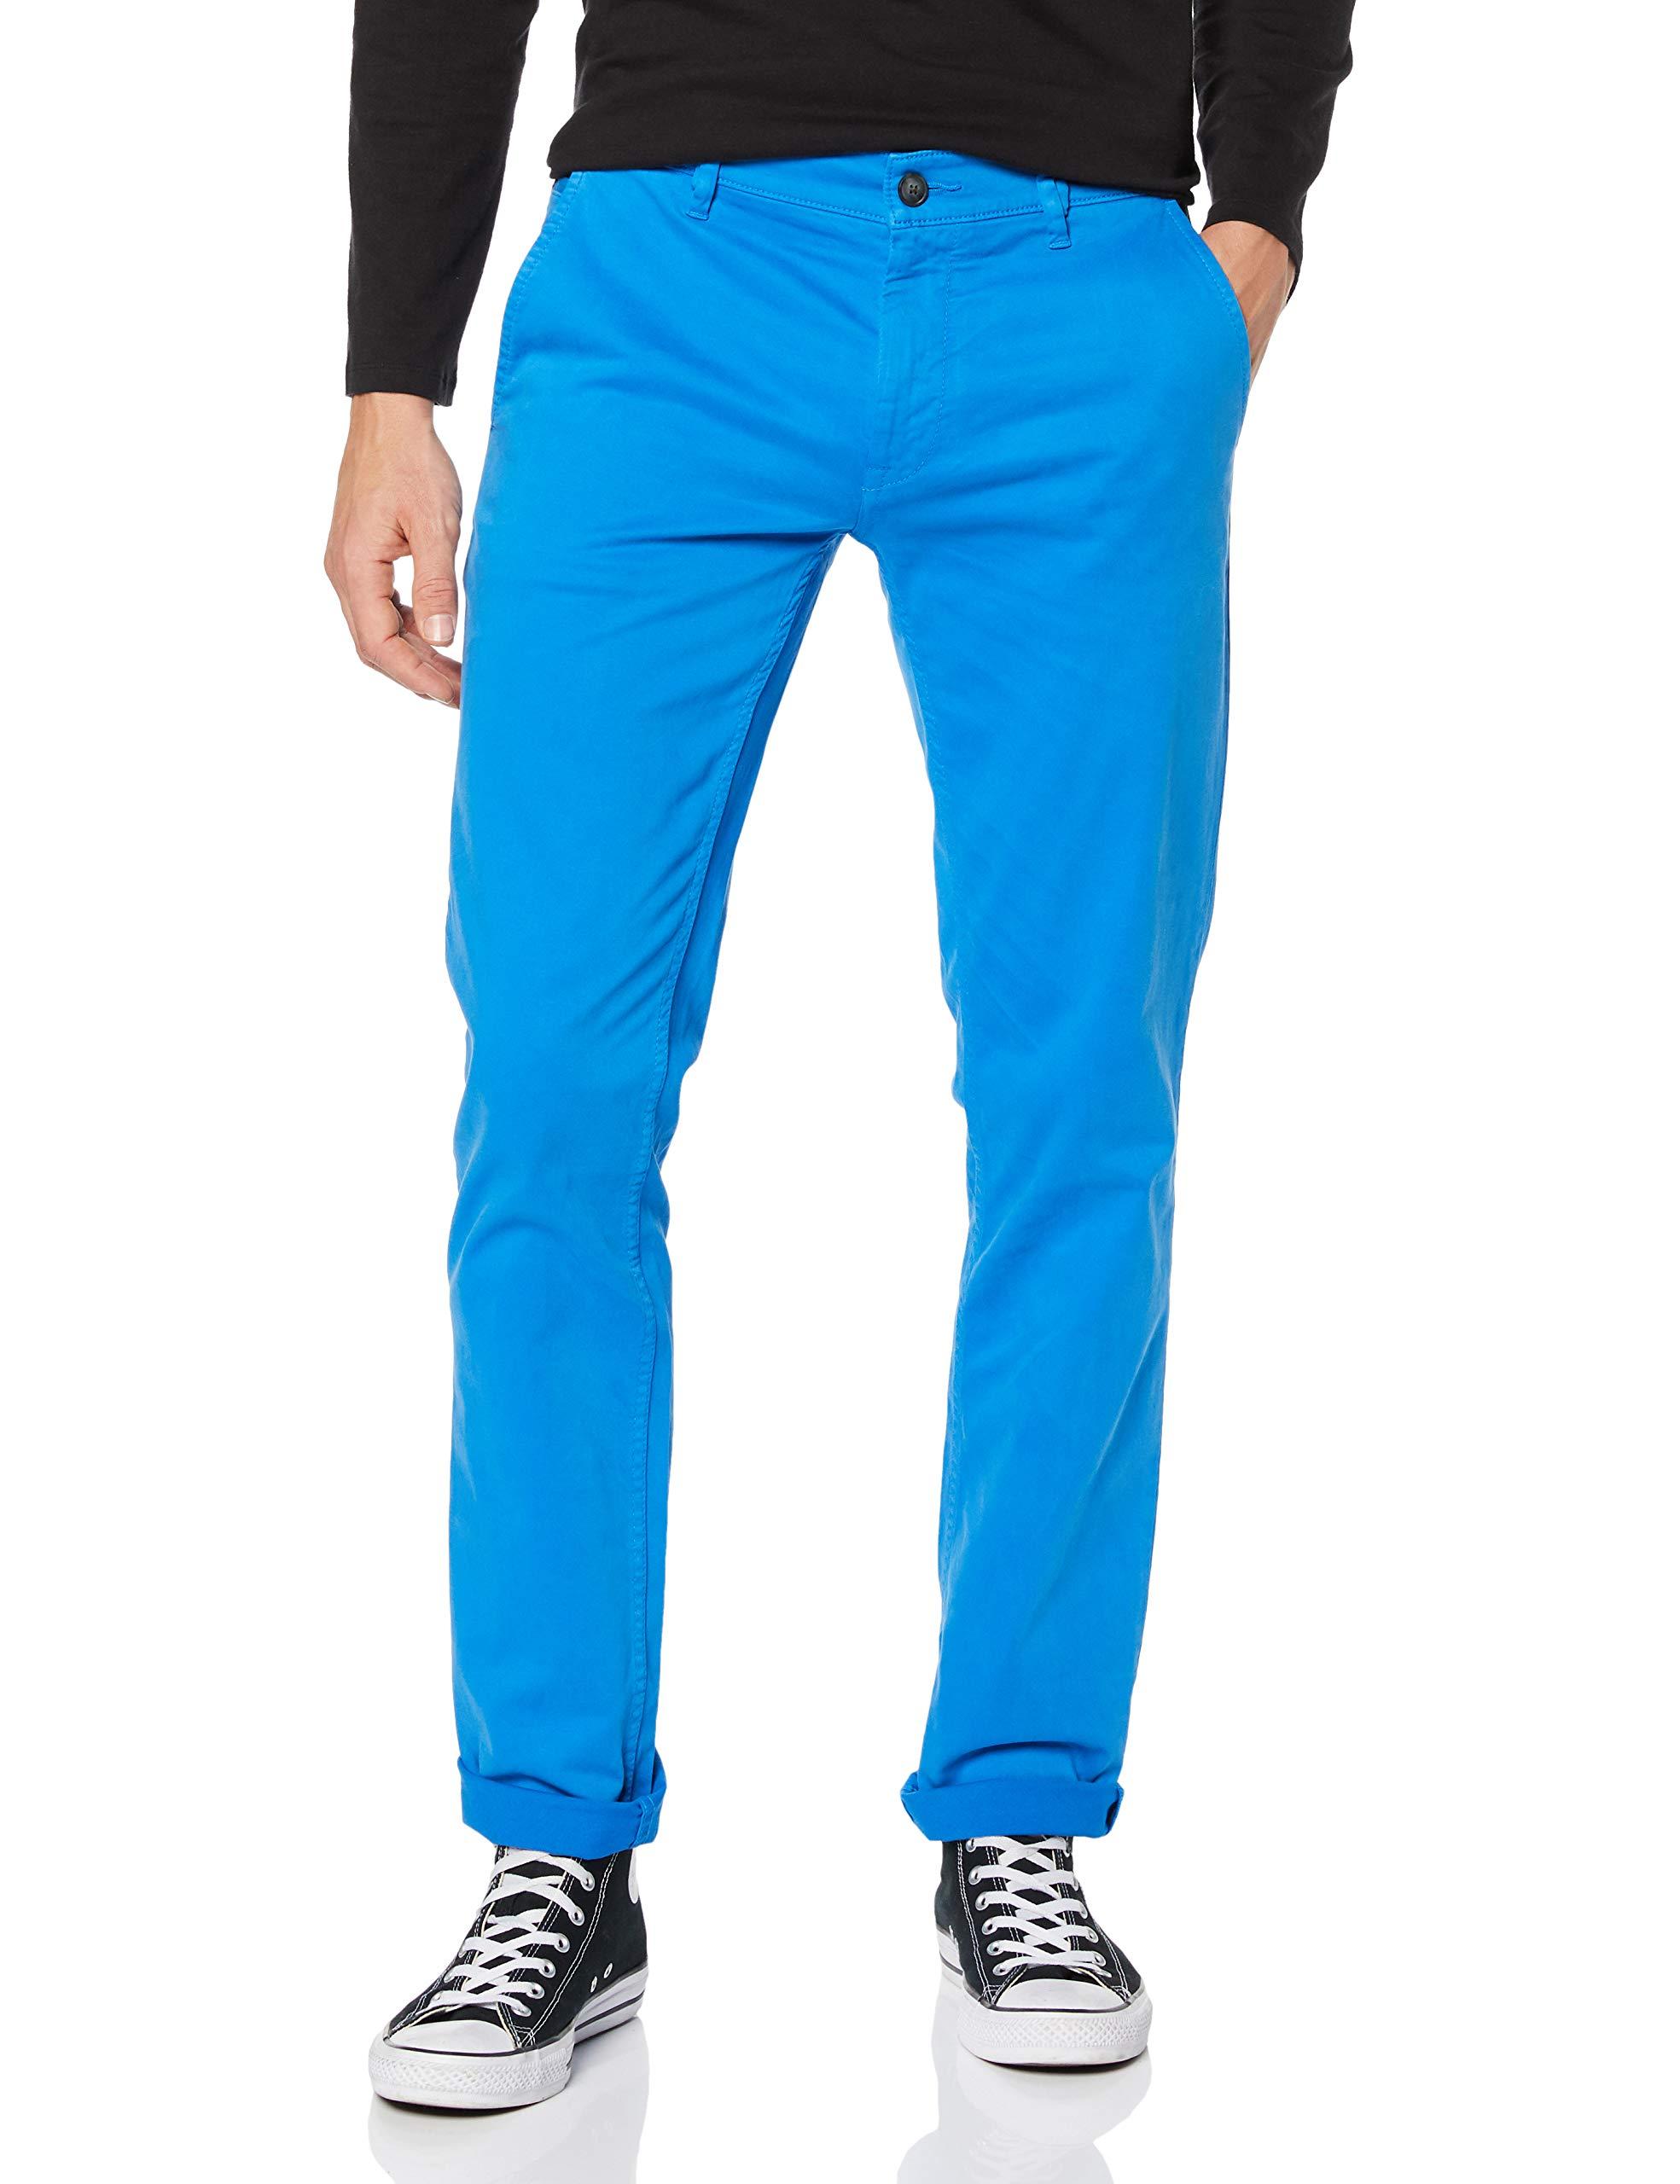 7f558cd1d2a Top Pantalons homme selon les notes Amazon.fr